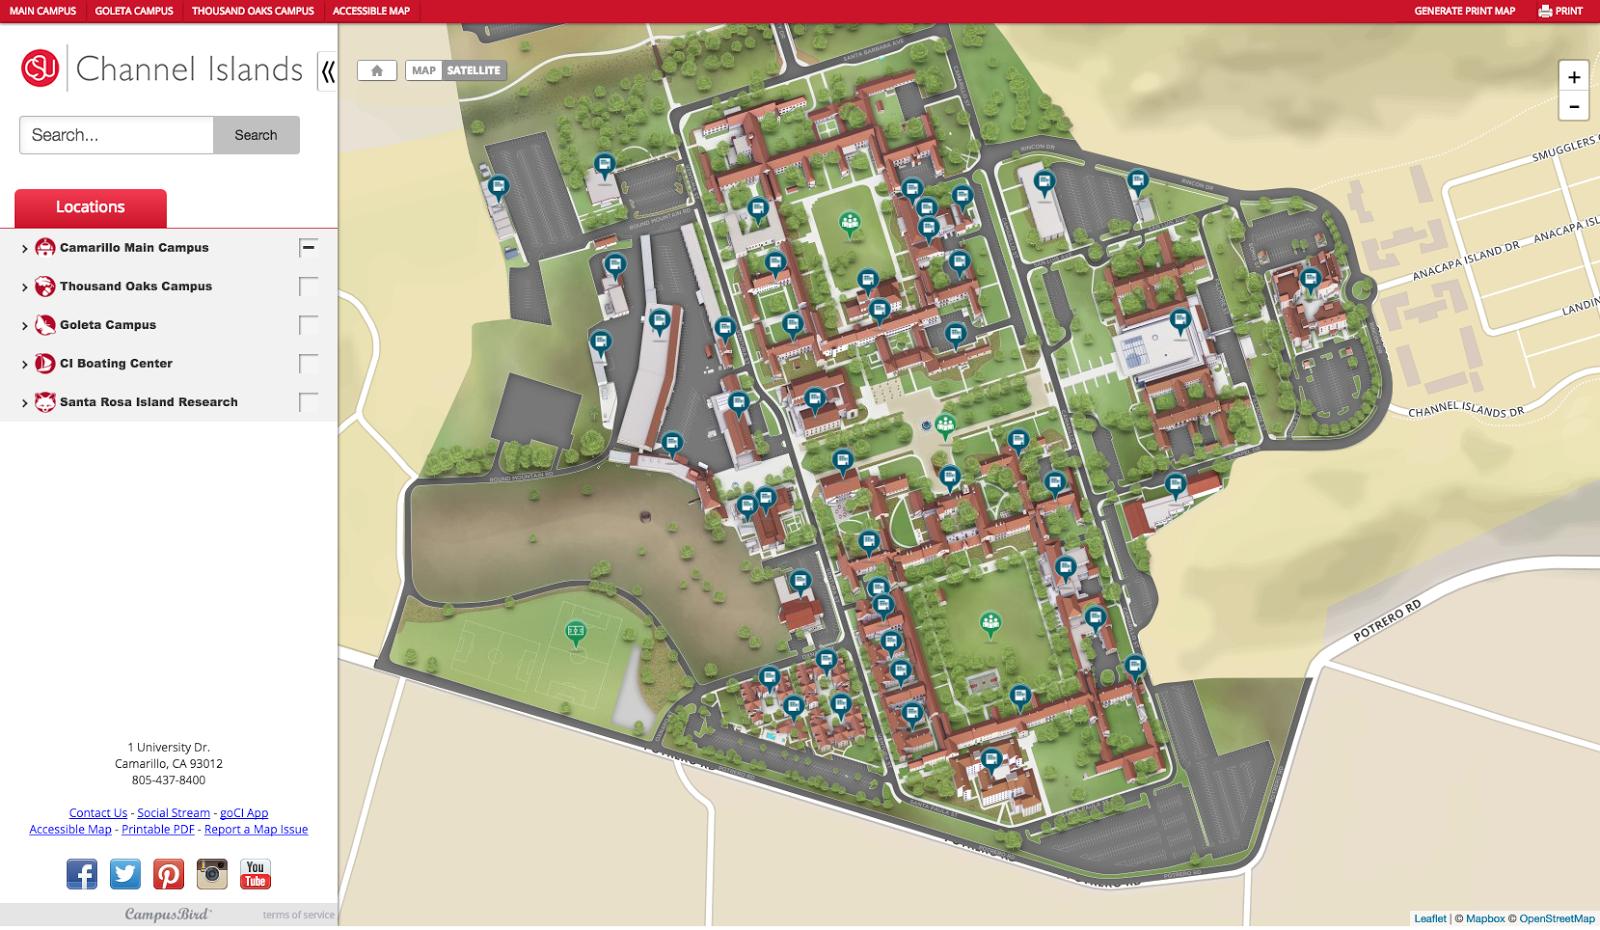 Csuci Campus Map CSUCI Launches new interactive campus map | CI Web Services Blog